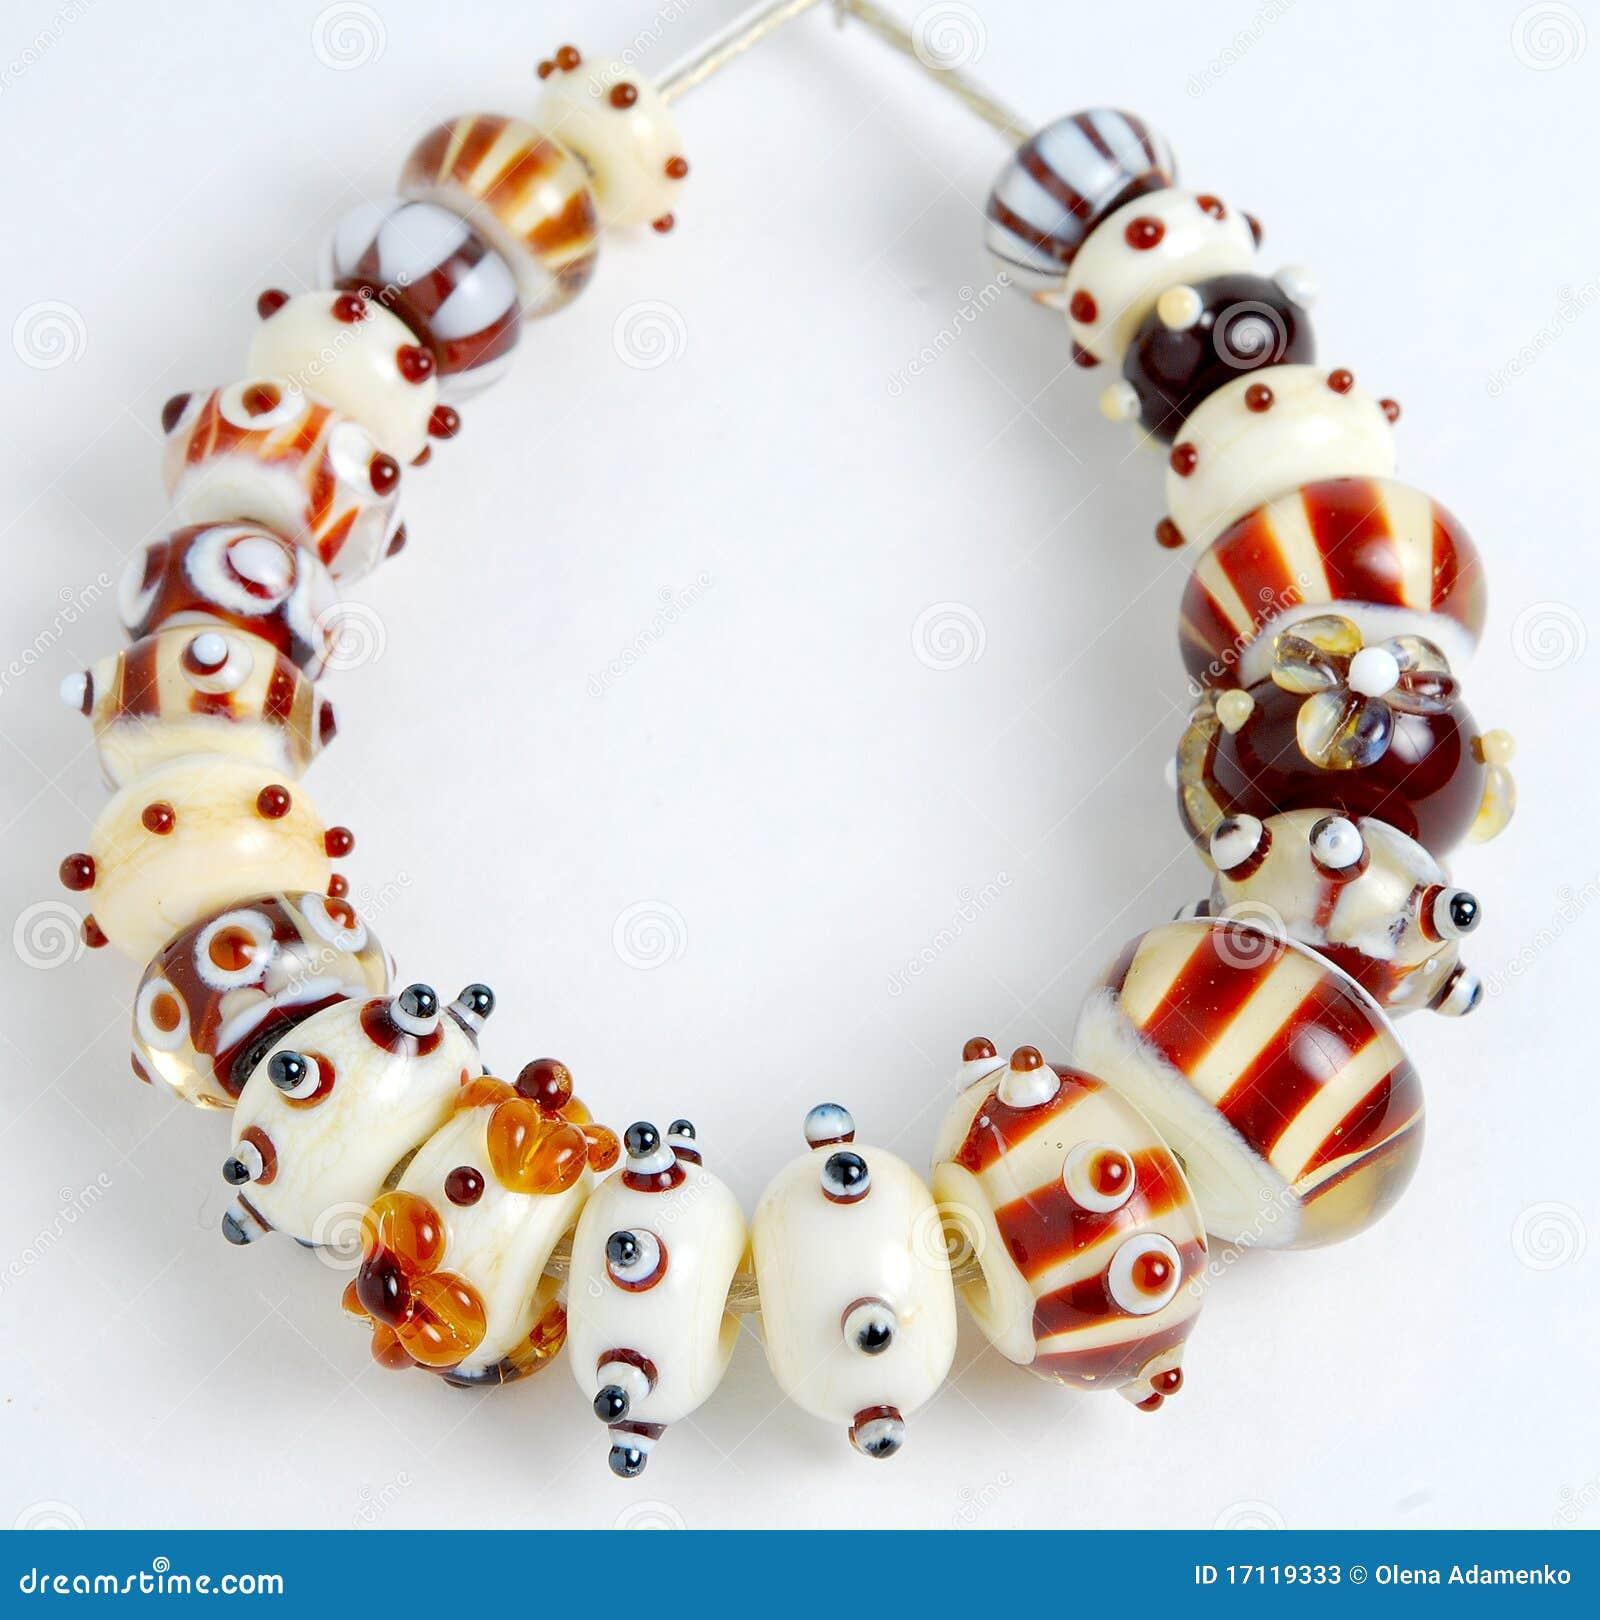 royaltyfree stock photo download handmade beads lampwork